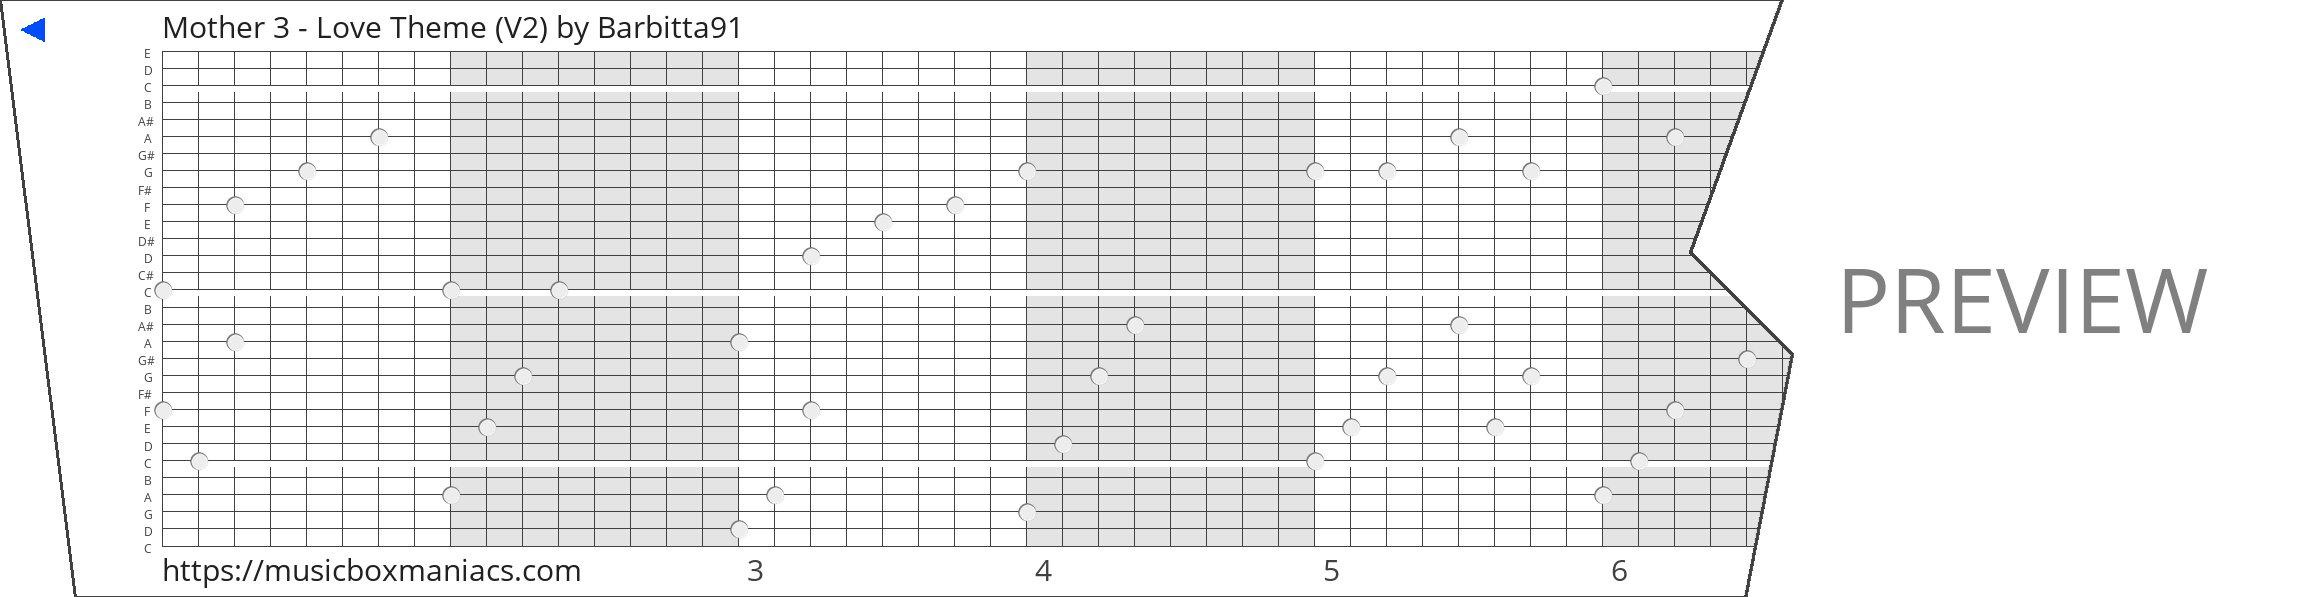 Mother 3 - Love Theme (V2) 30 note music box paper strip